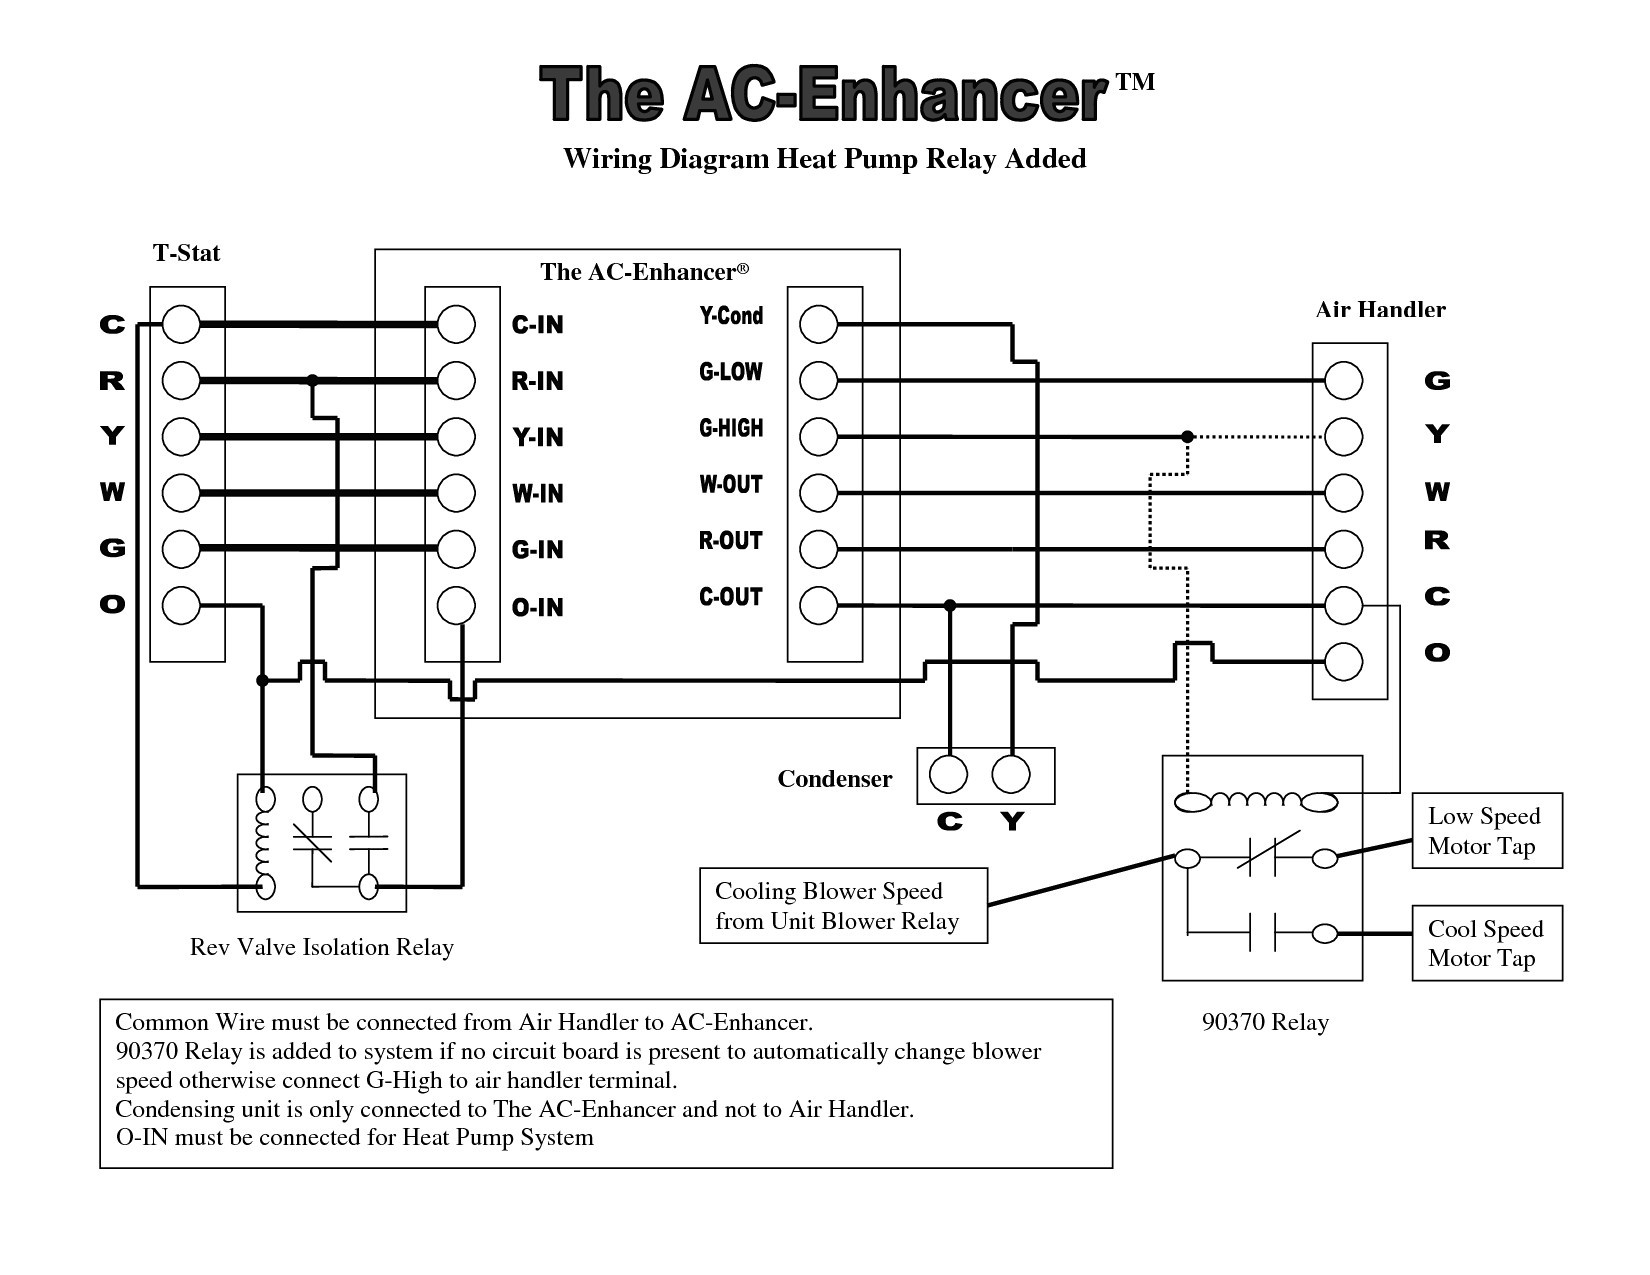 Carrier Heat Pump Wiring Diagram Elegant Heat Pump Wiring Diagram Diagram Of Carrier Heat Pump Wiring Diagram